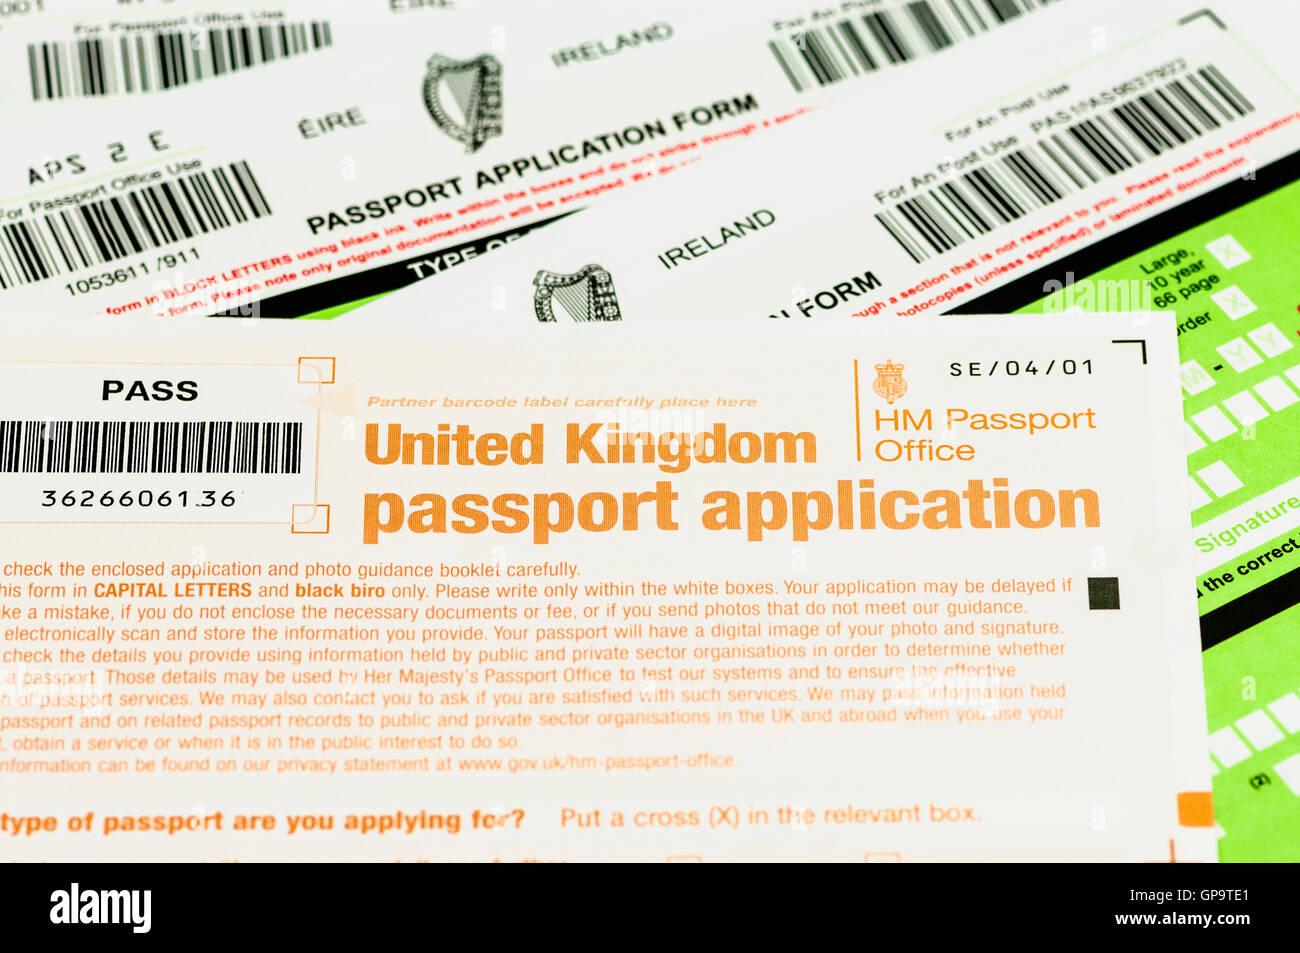 Passport application forms for both republic of ireland eire passport application forms for both republic of ireland eire and united kingdom uk falaconquin